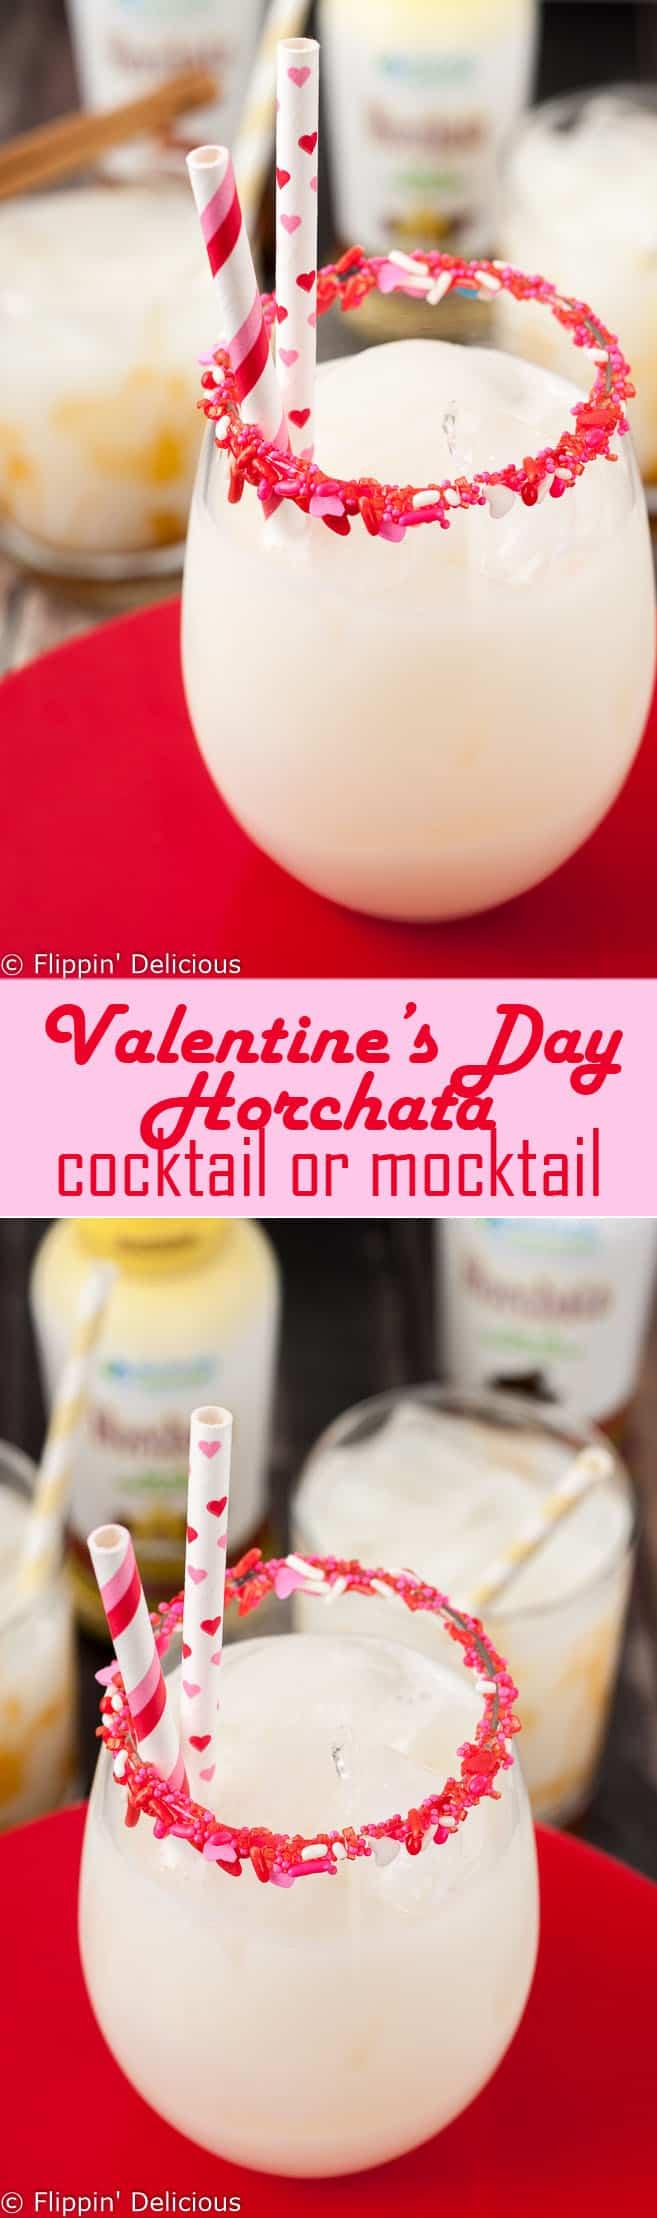 Easy Valentine's Day Horchata cocktail or mocktail . Just 2 ingredients + sprinkles!